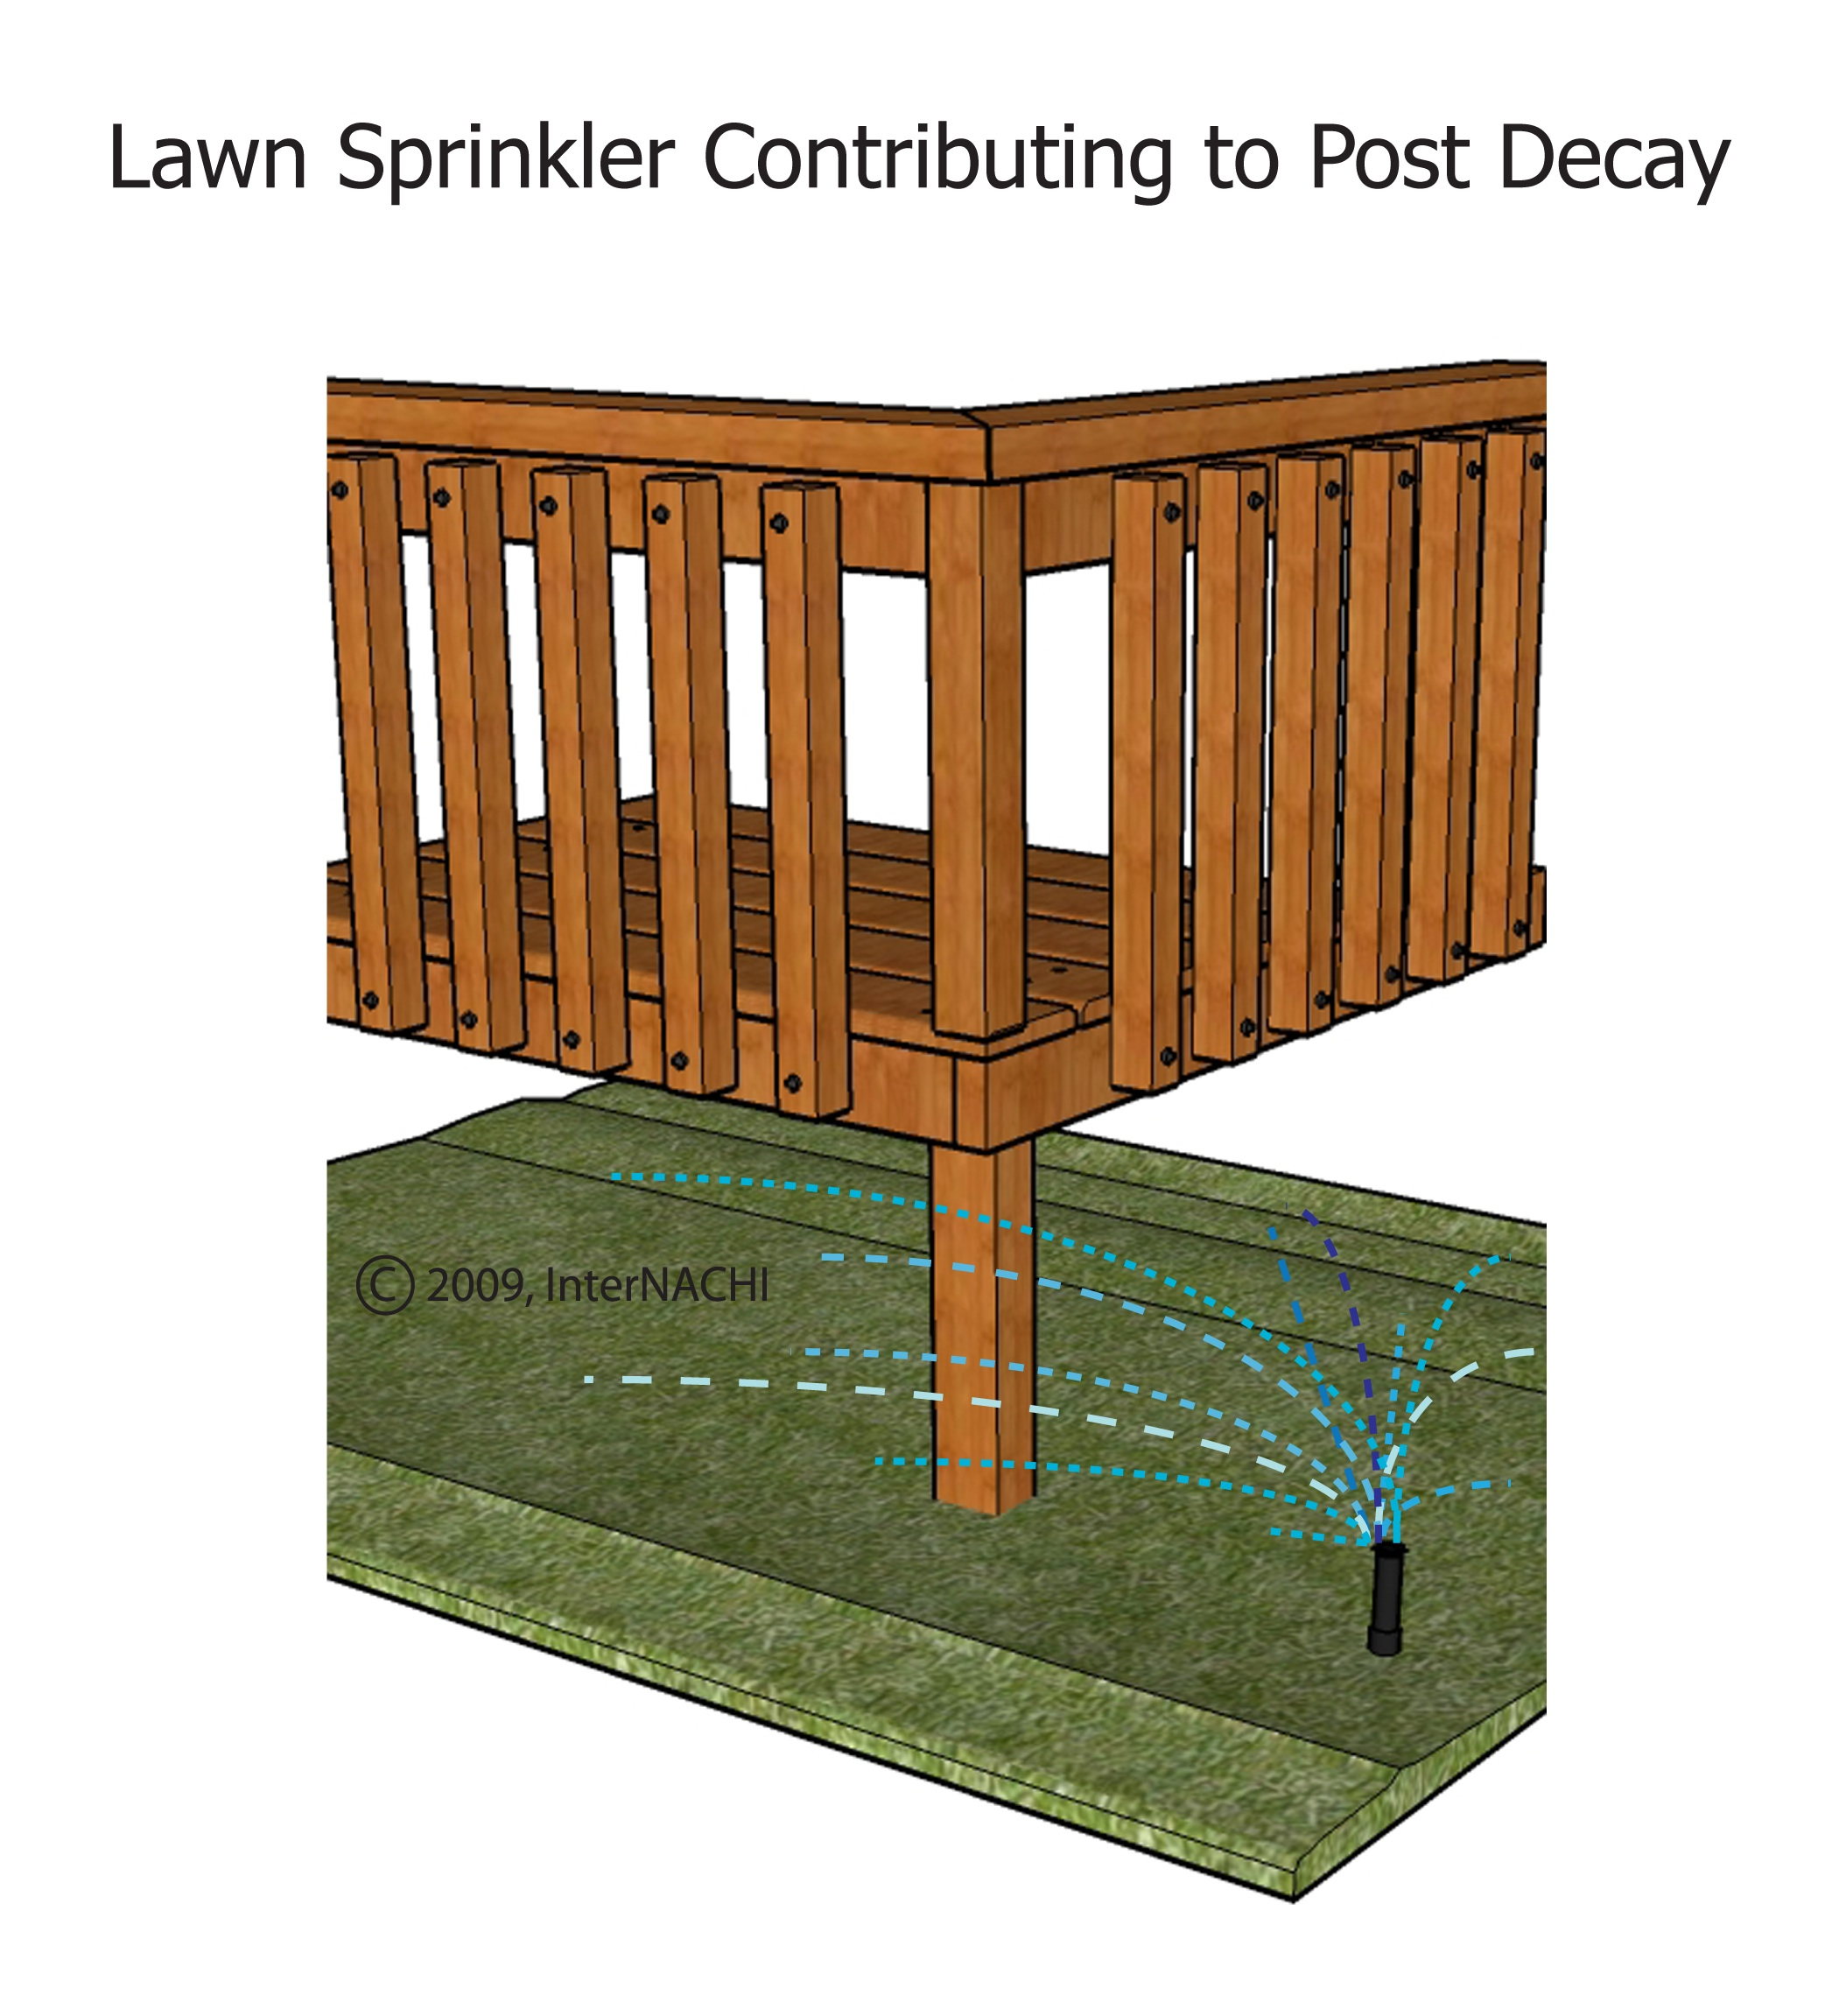 Lawn Sprinkler causes deck decay